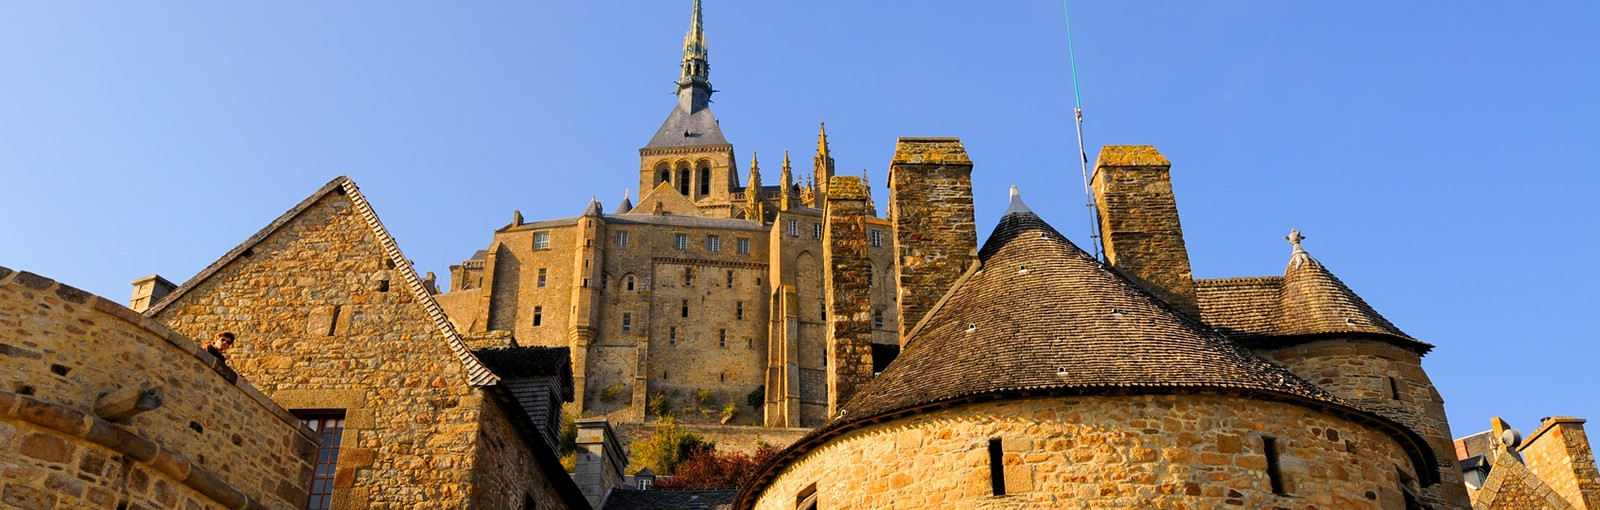 El Mont-Saint-Michel